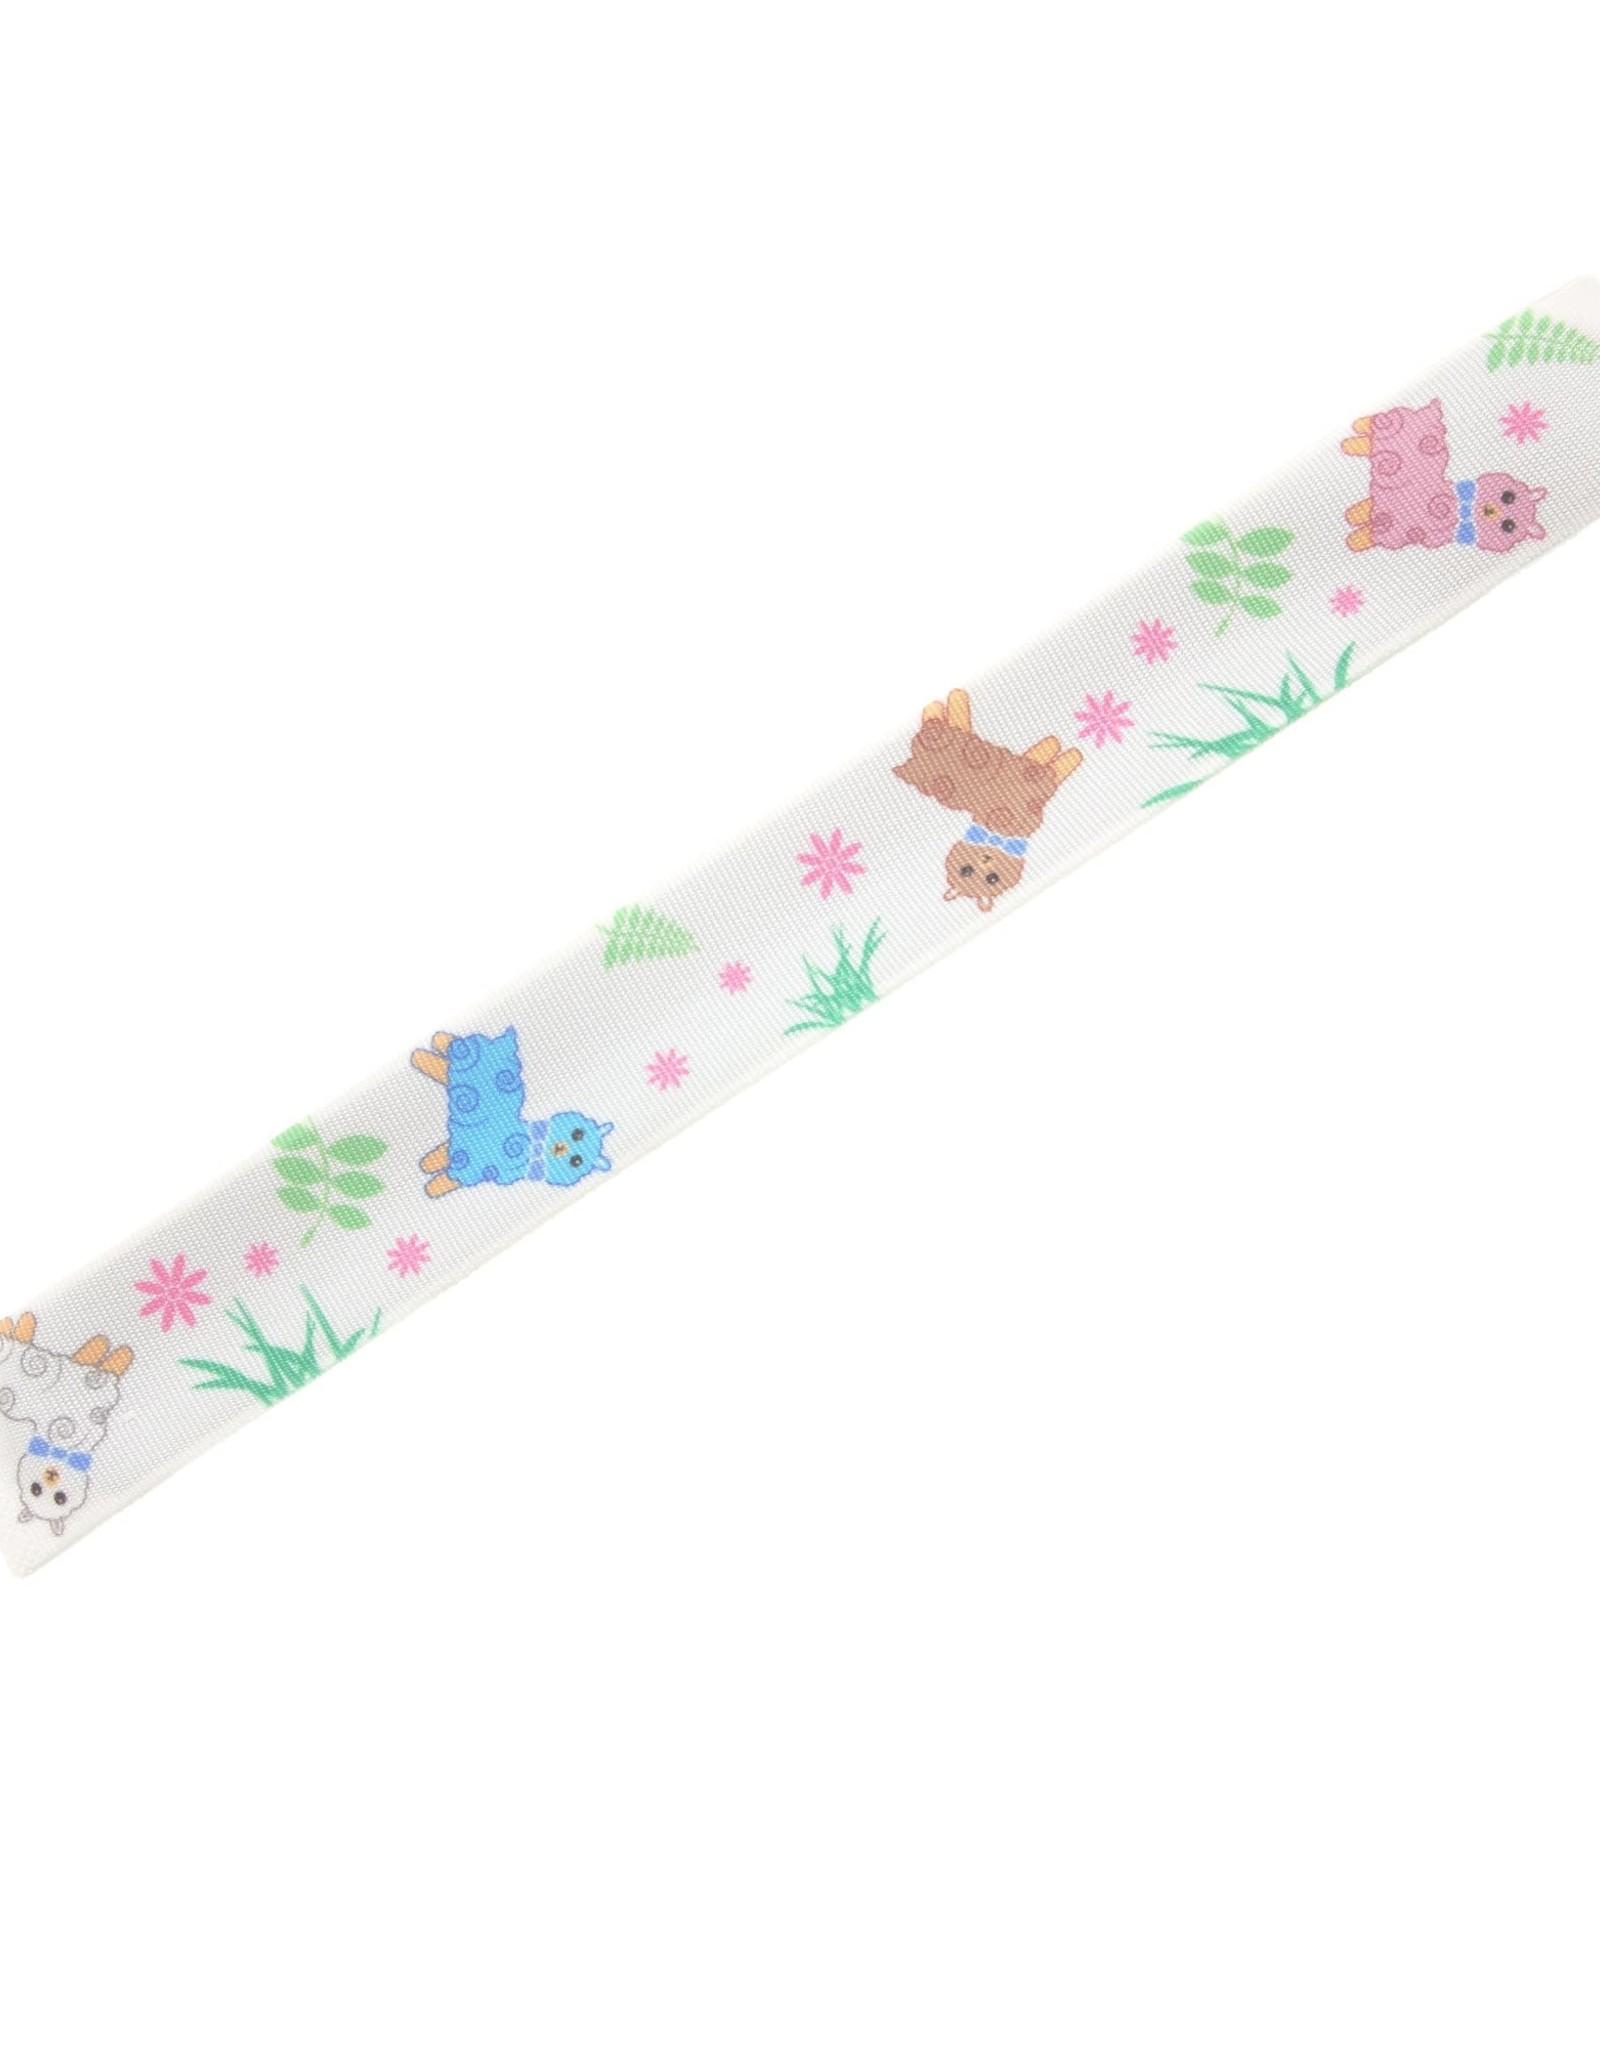 House of Marbles Llama Slap Bracelet